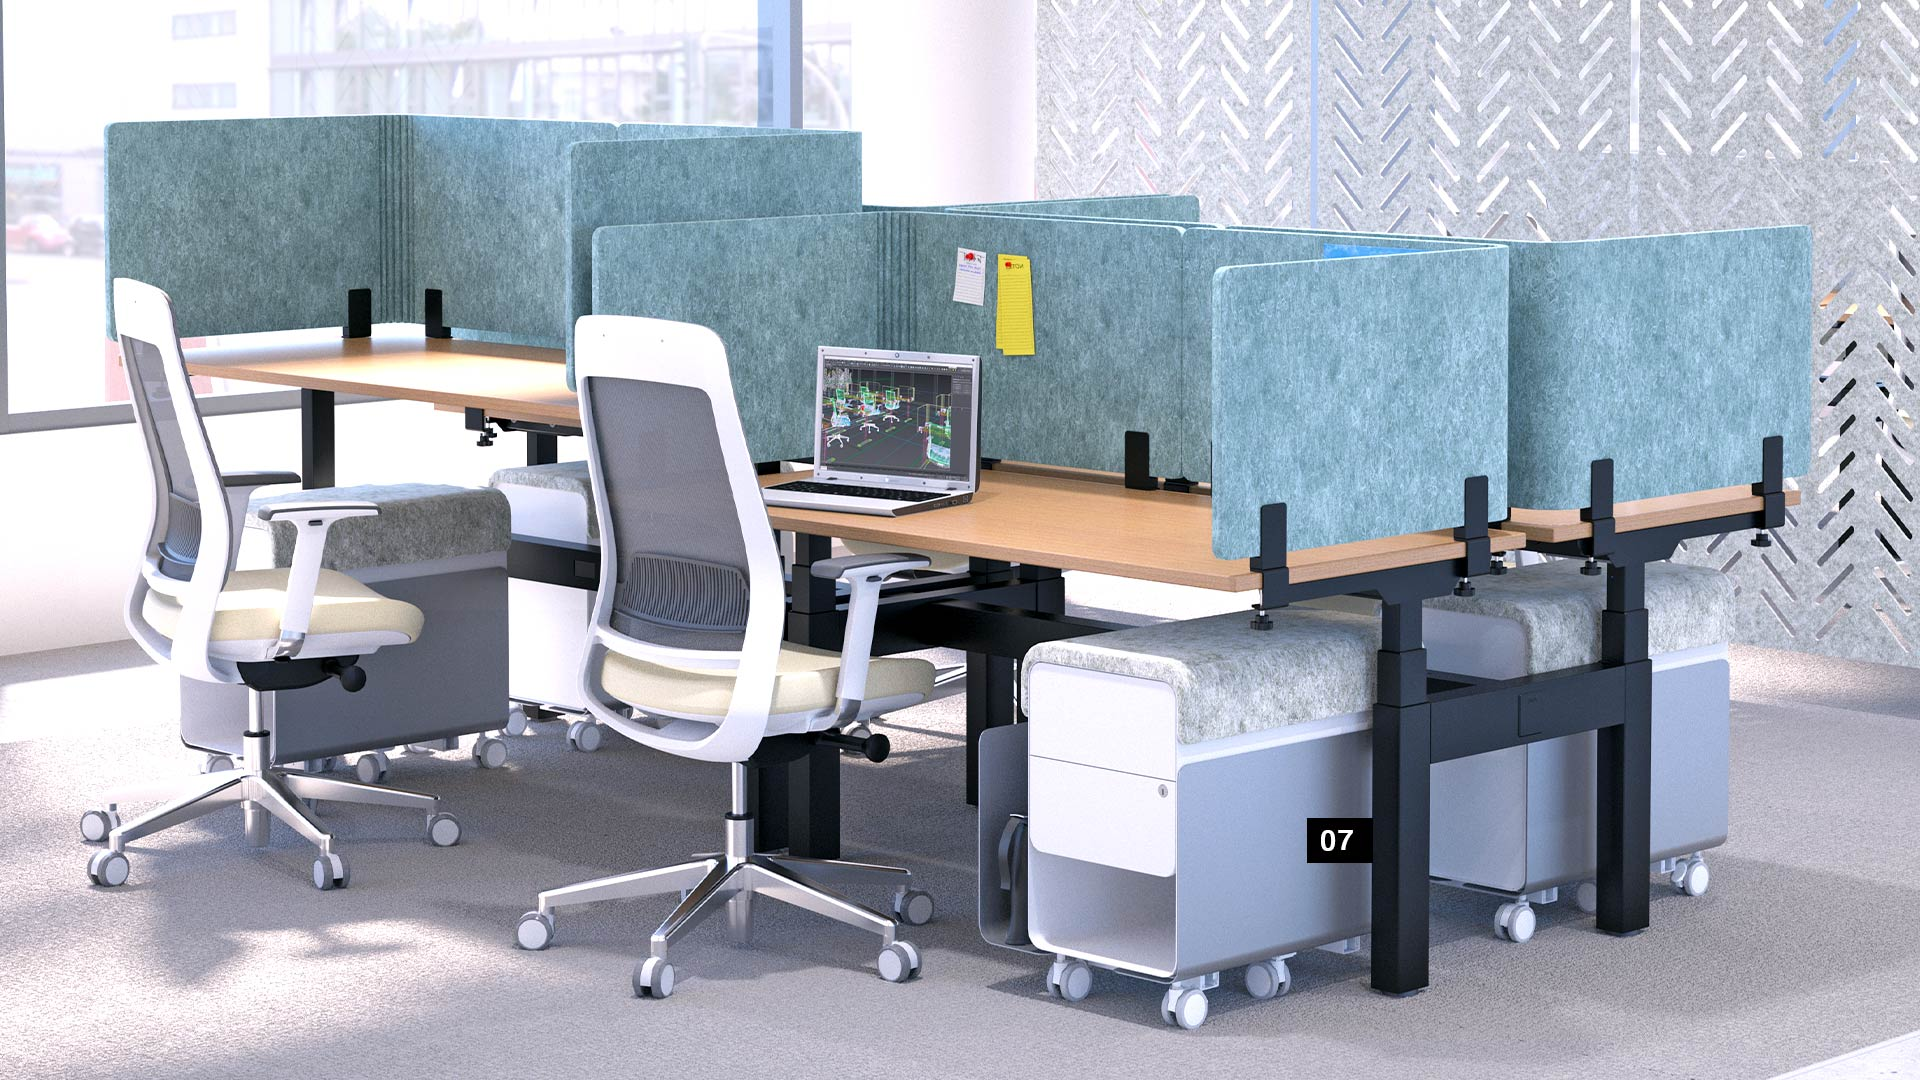 abstract-modern-furniture-amq-half-screen